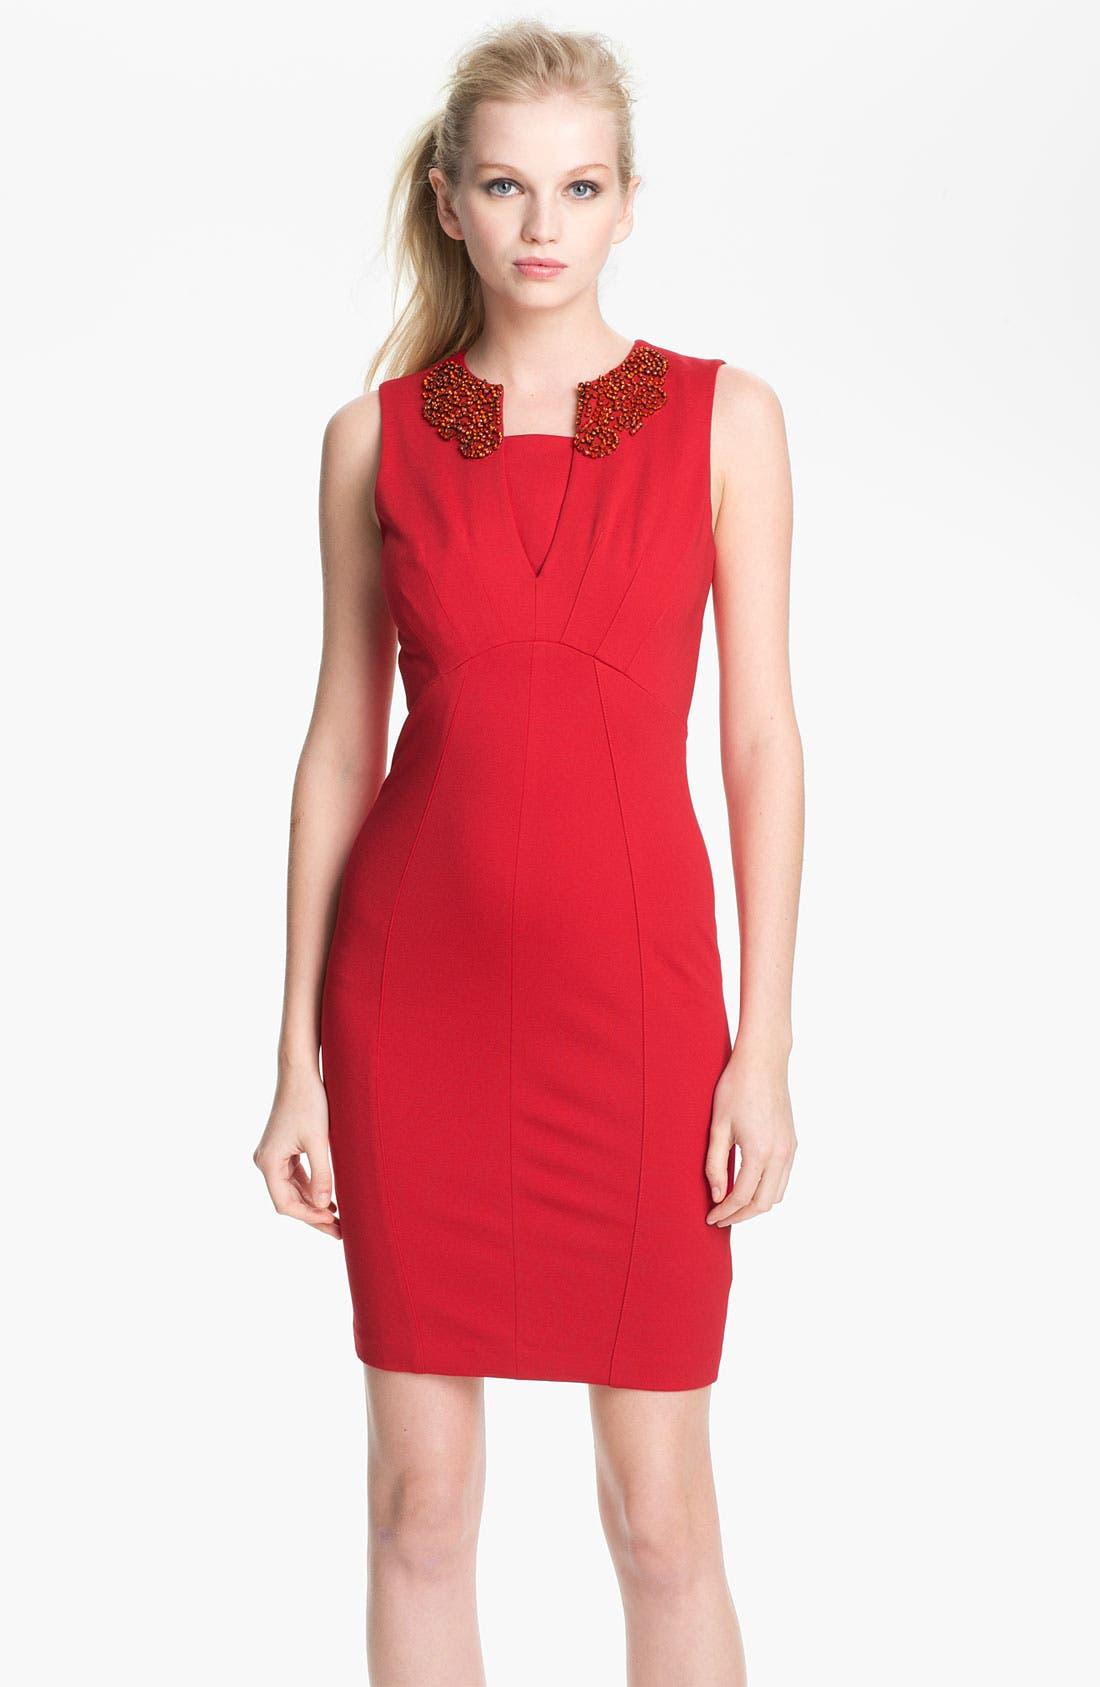 Alternate Image 1 Selected - Ted Baker London 'Edella' Embellished Sheath Dress